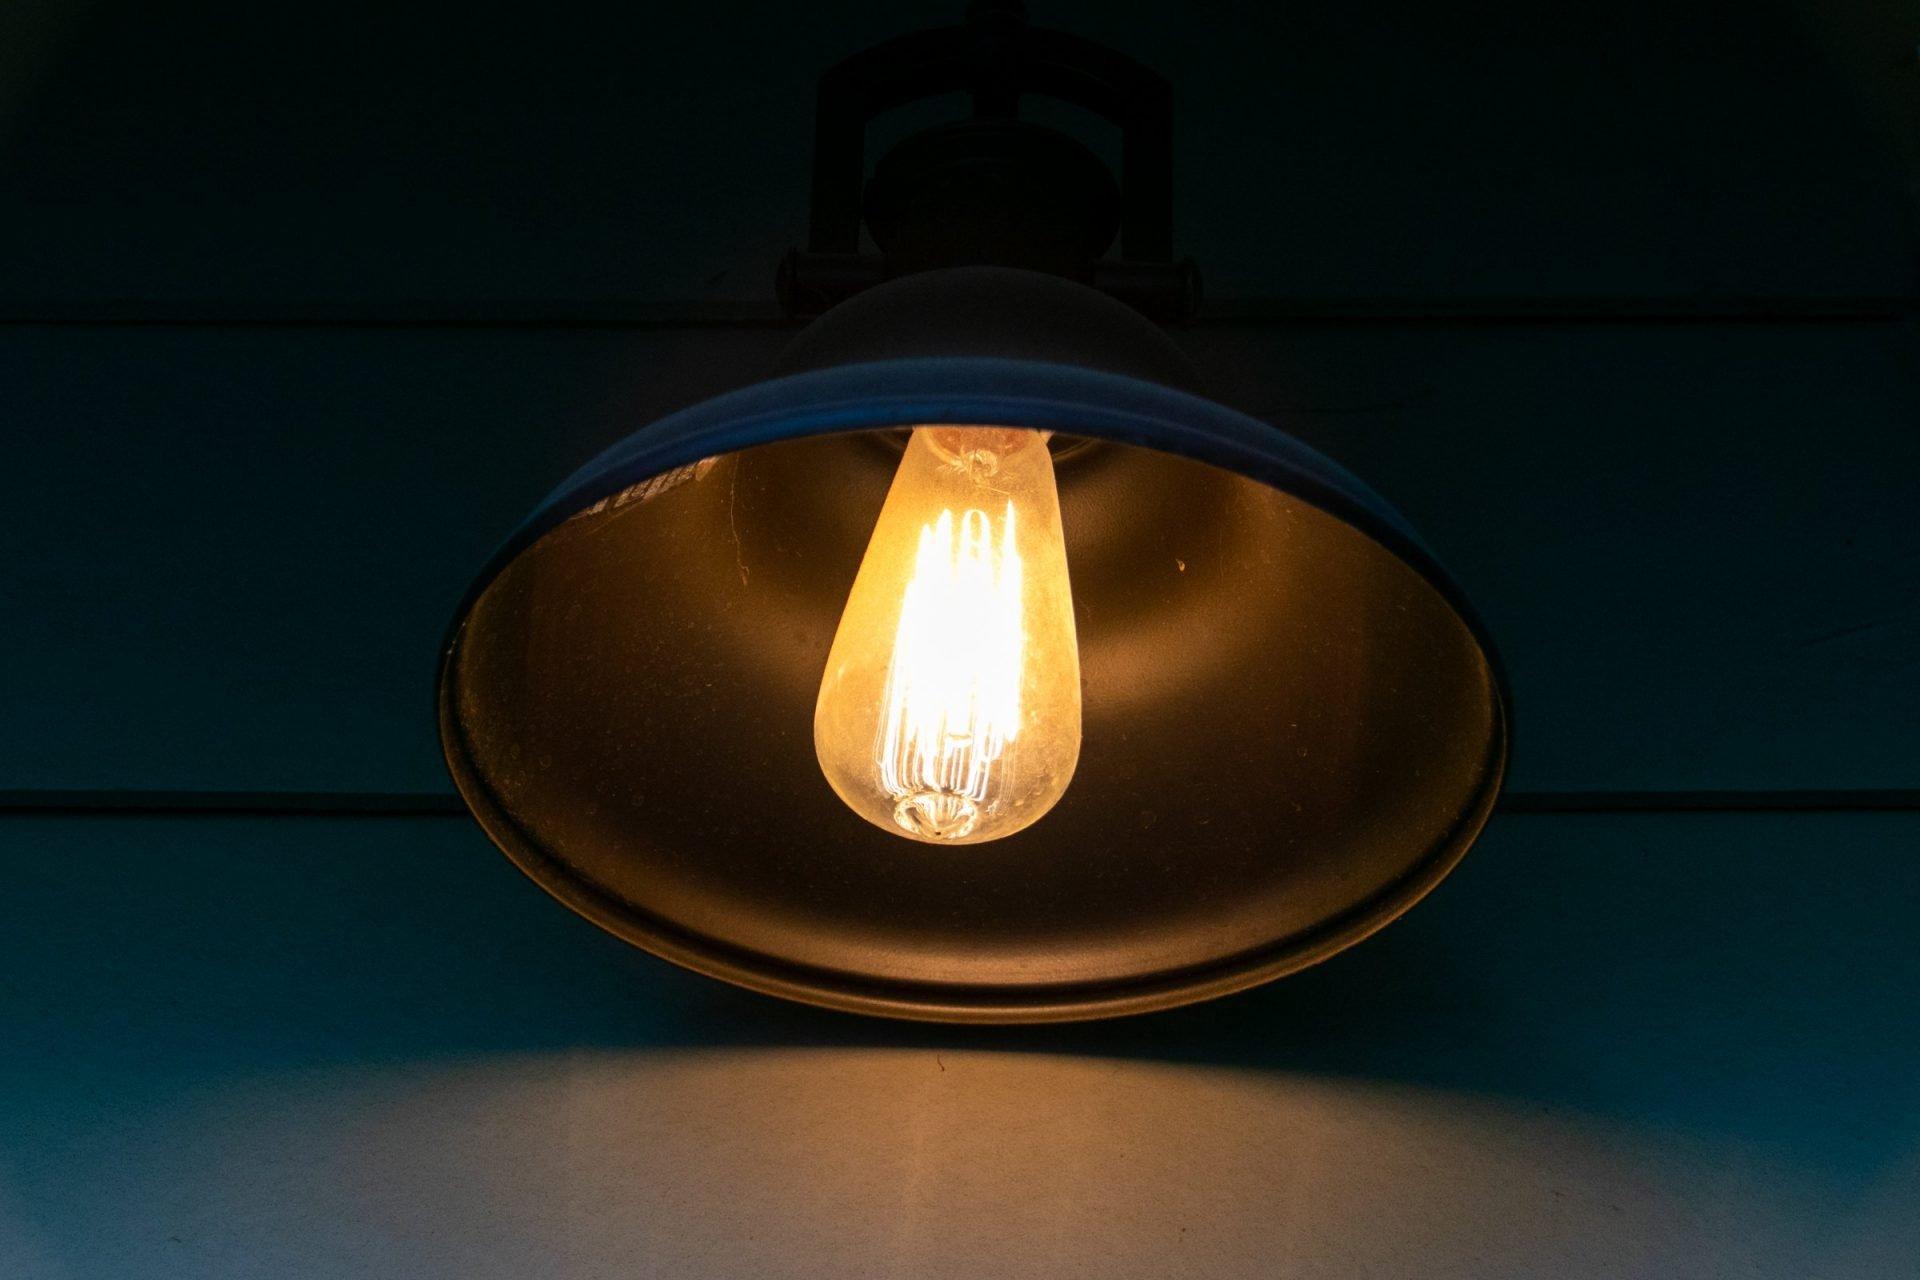 Lit Light Bulb In Wall Sconce